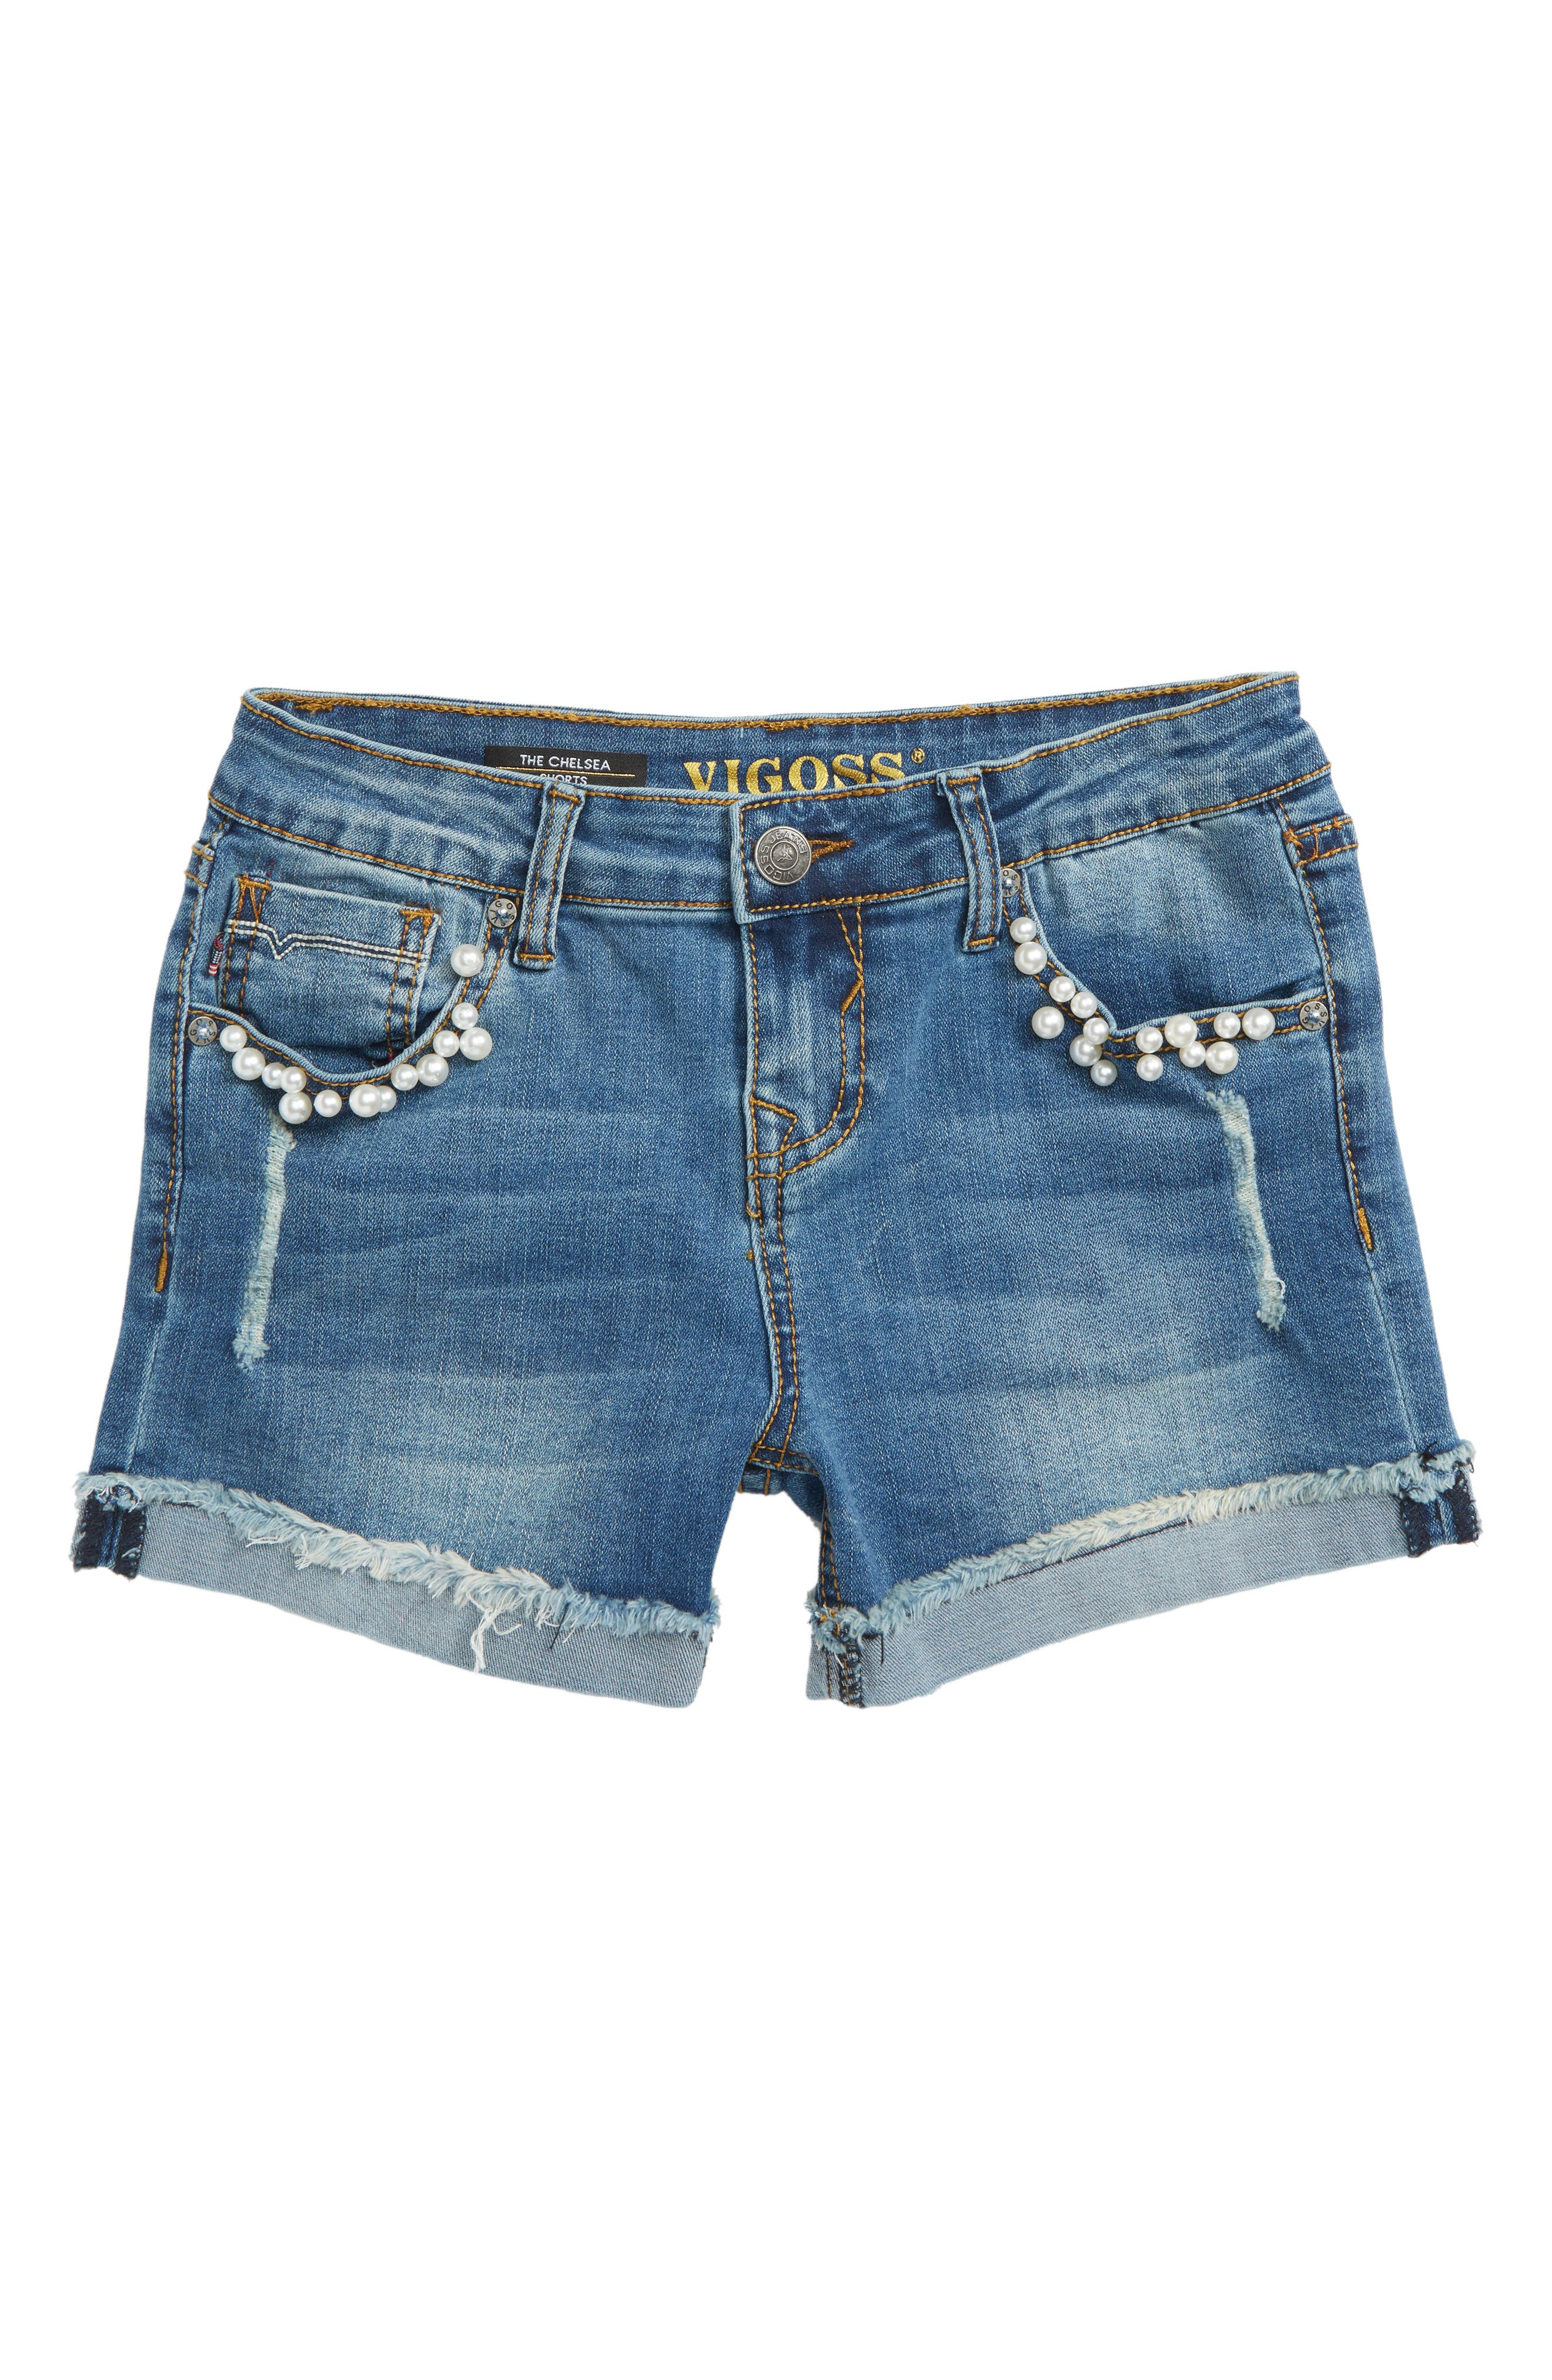 Imitation Pearl Frayed Denim Shorts,                         Main,                         color, Regal Blue